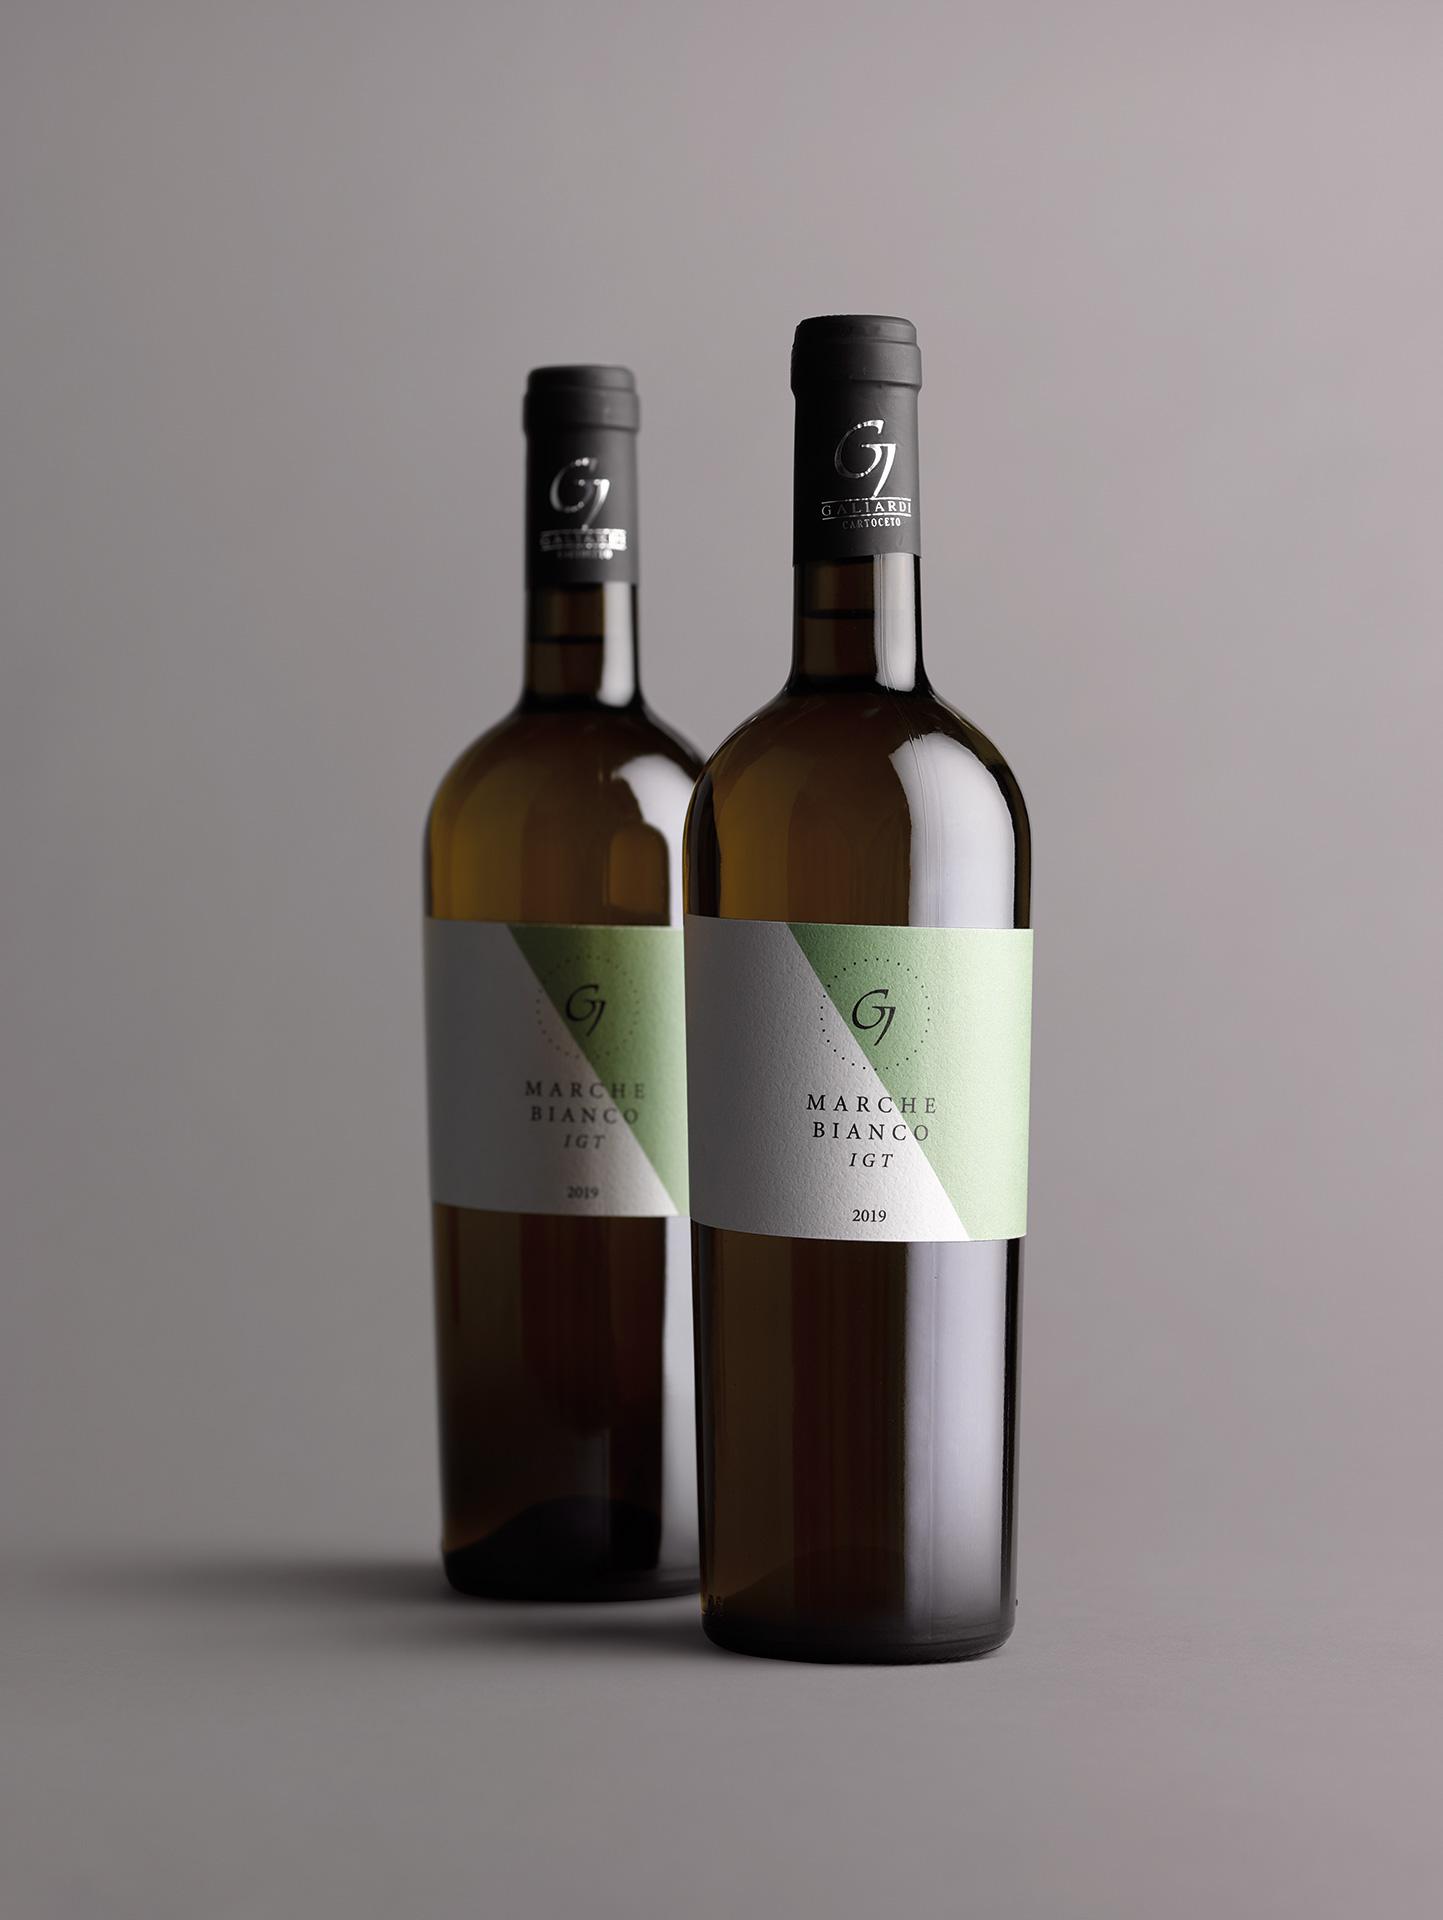 GALIARDI – Azienda Agricola Cartoceto – Marche Bianco IGT